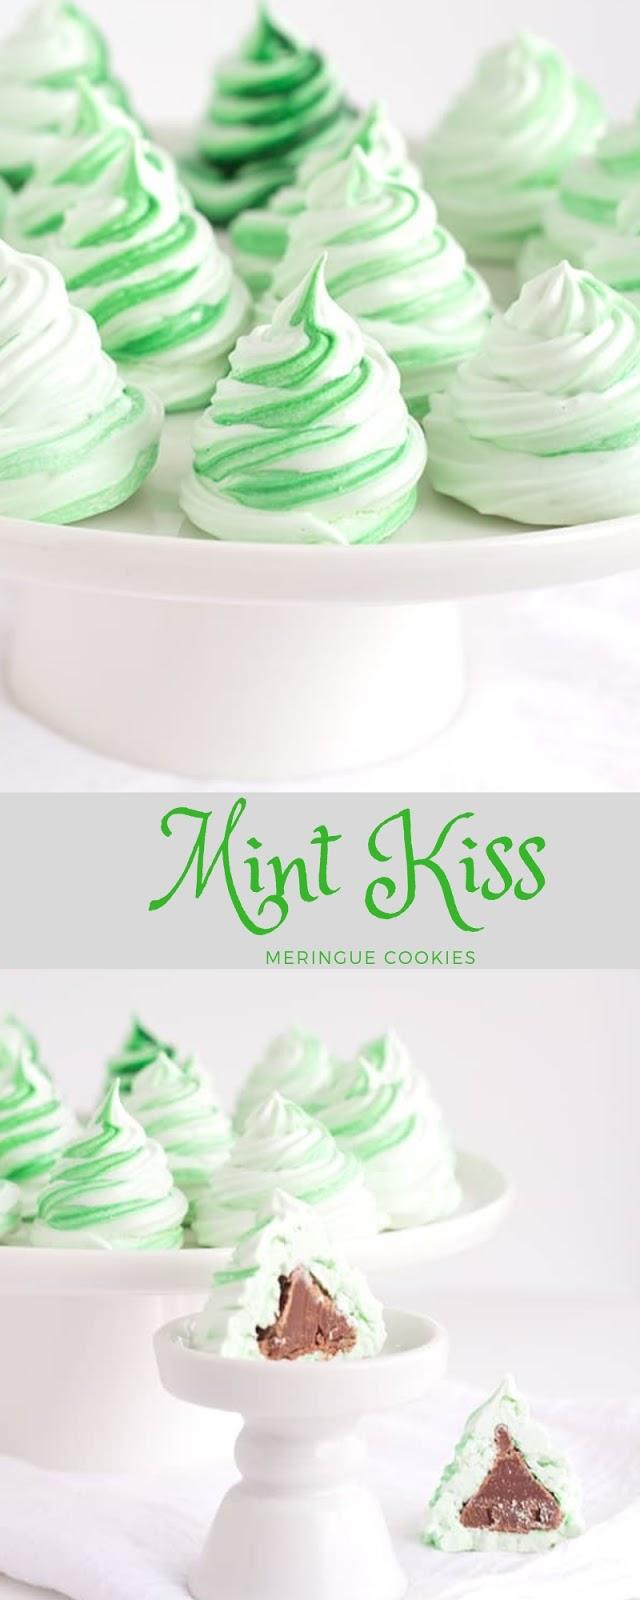 Mint Kiss Meringue Cookies